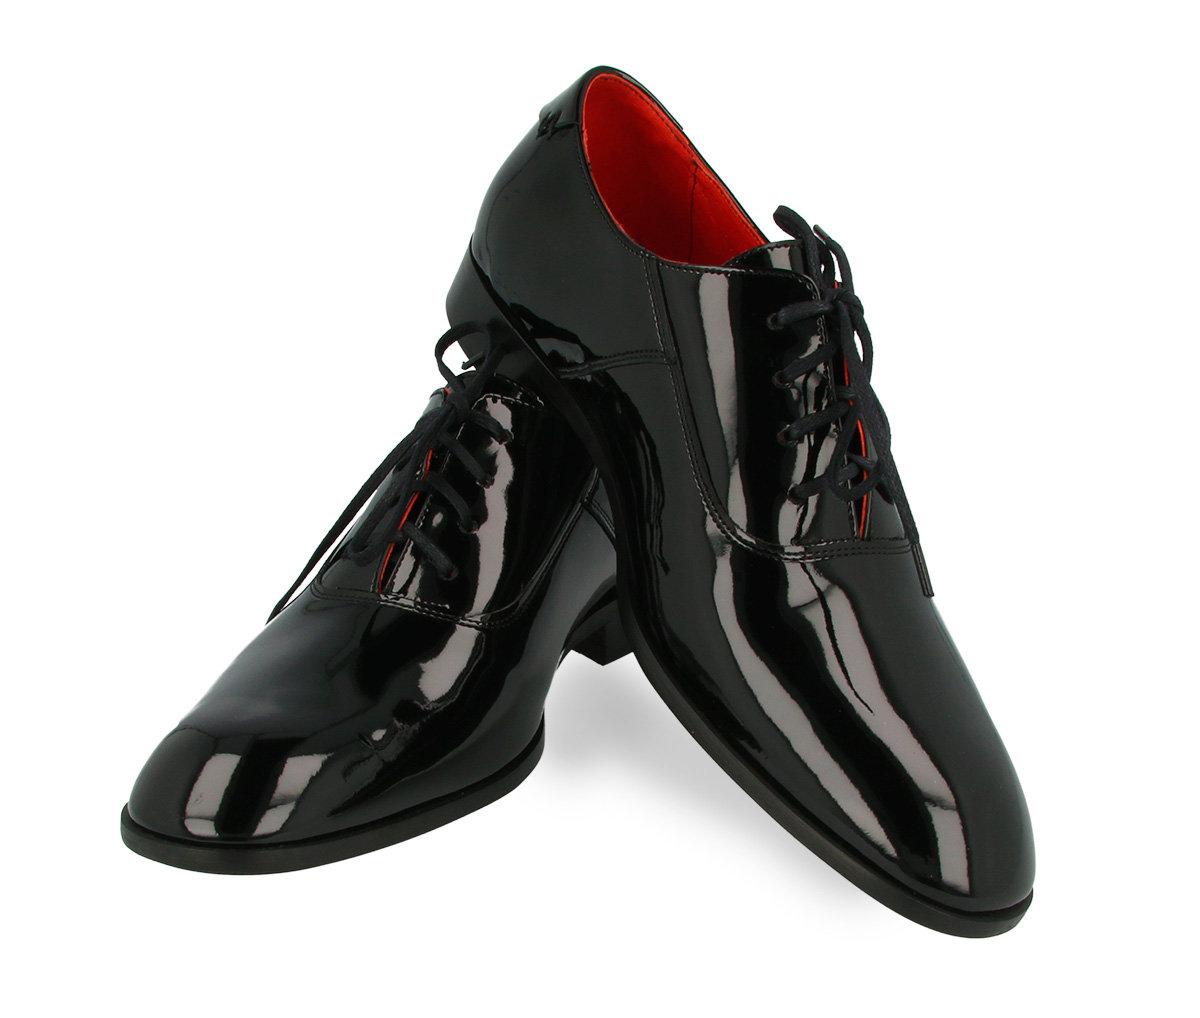 e9abe5830b041 Lakierowane buty ślubne Pana Młodego